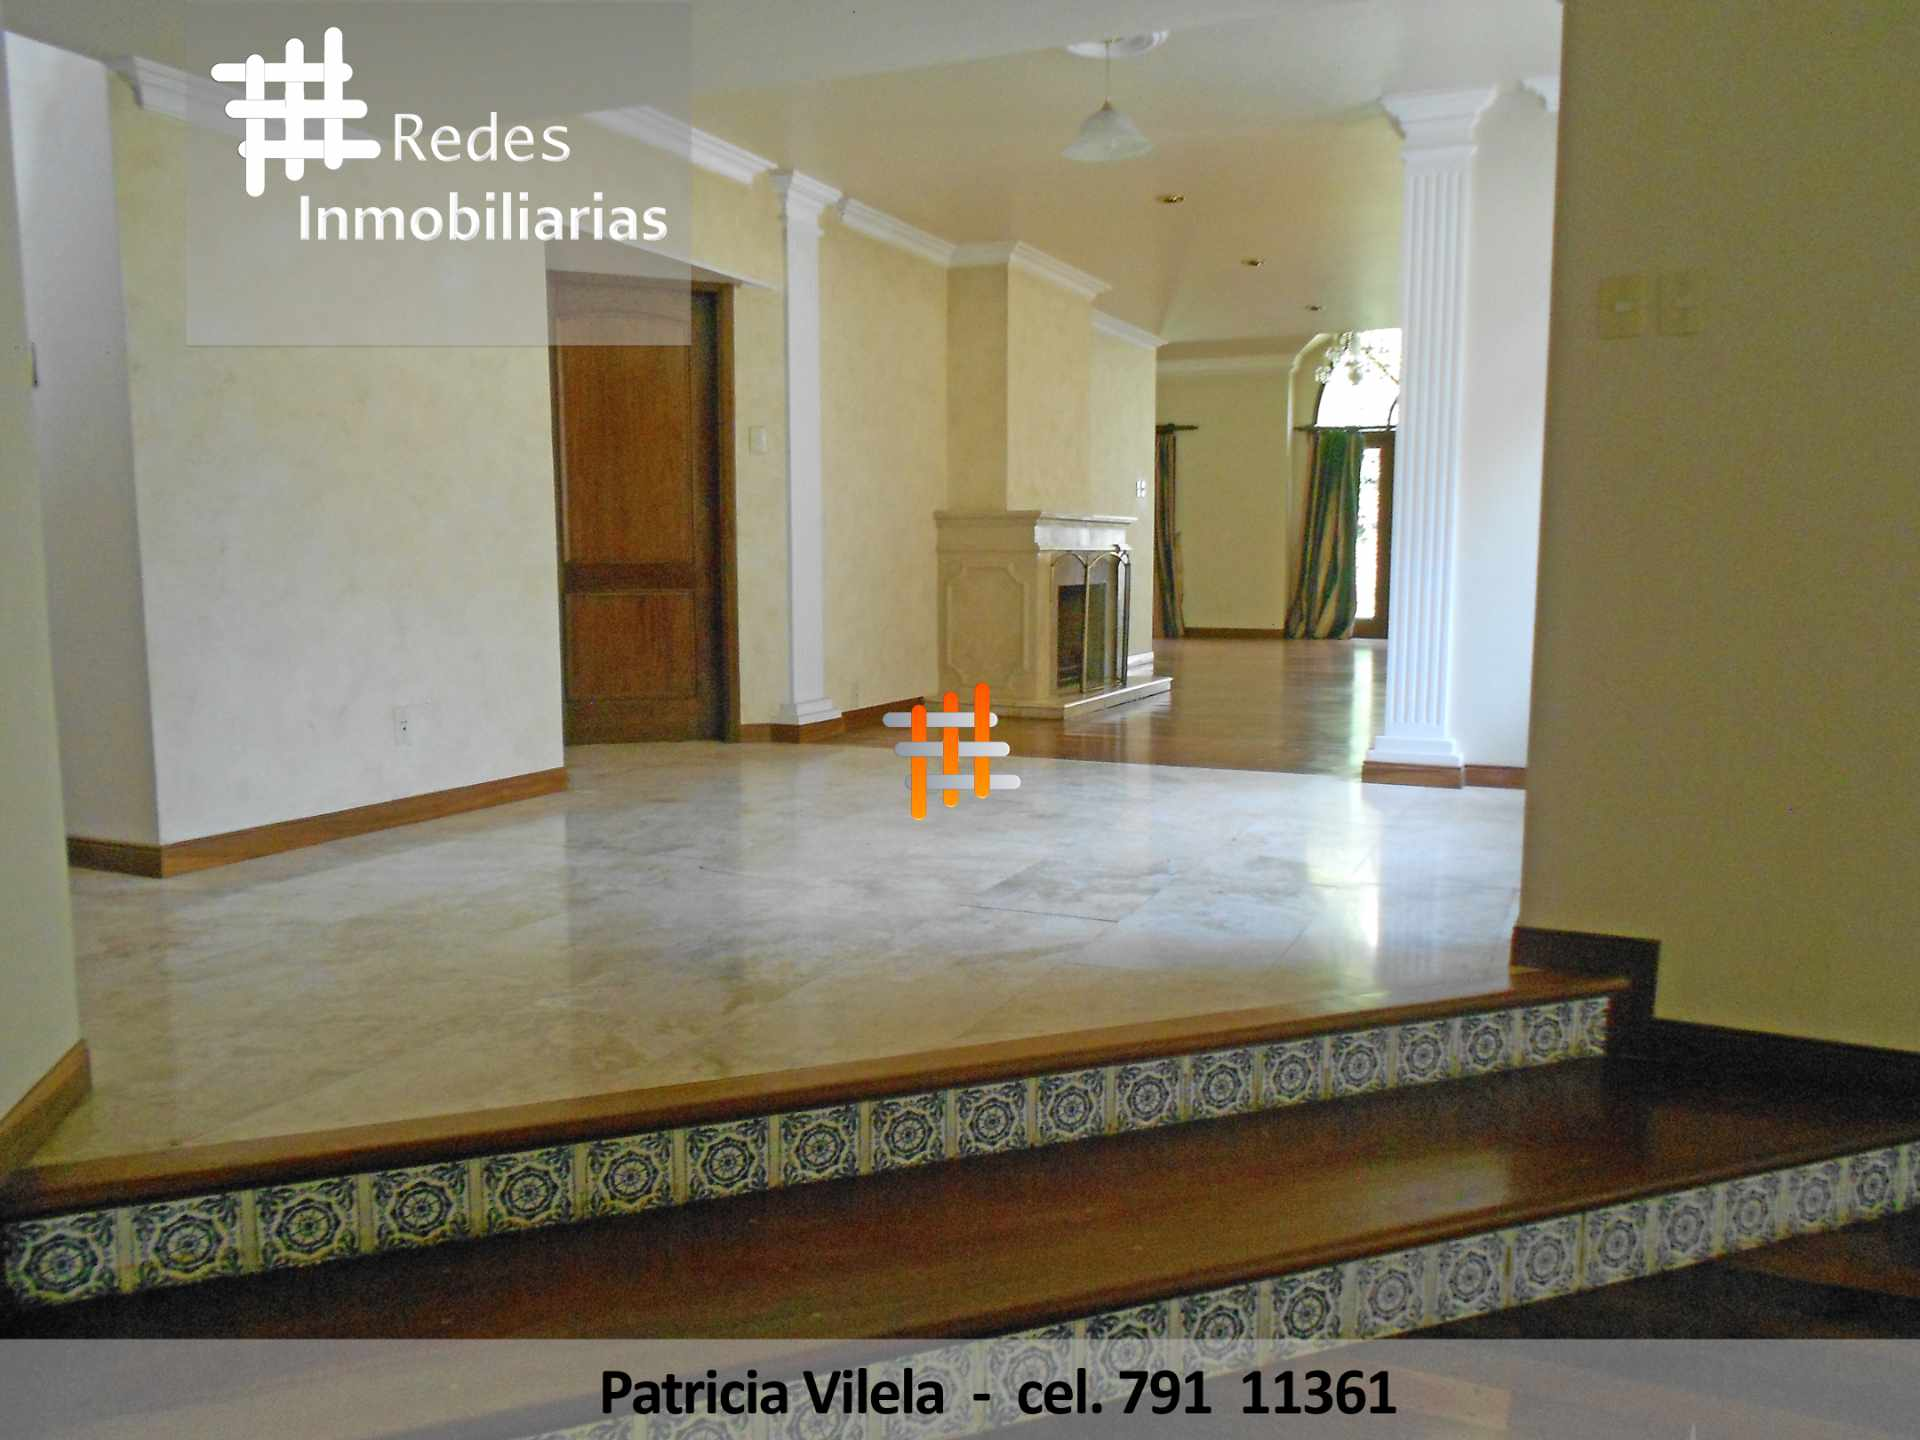 Casa en Alquiler  HERMOSA RESIDENCIA EN ALQUILER  ...ARANJUEZ Foto 27